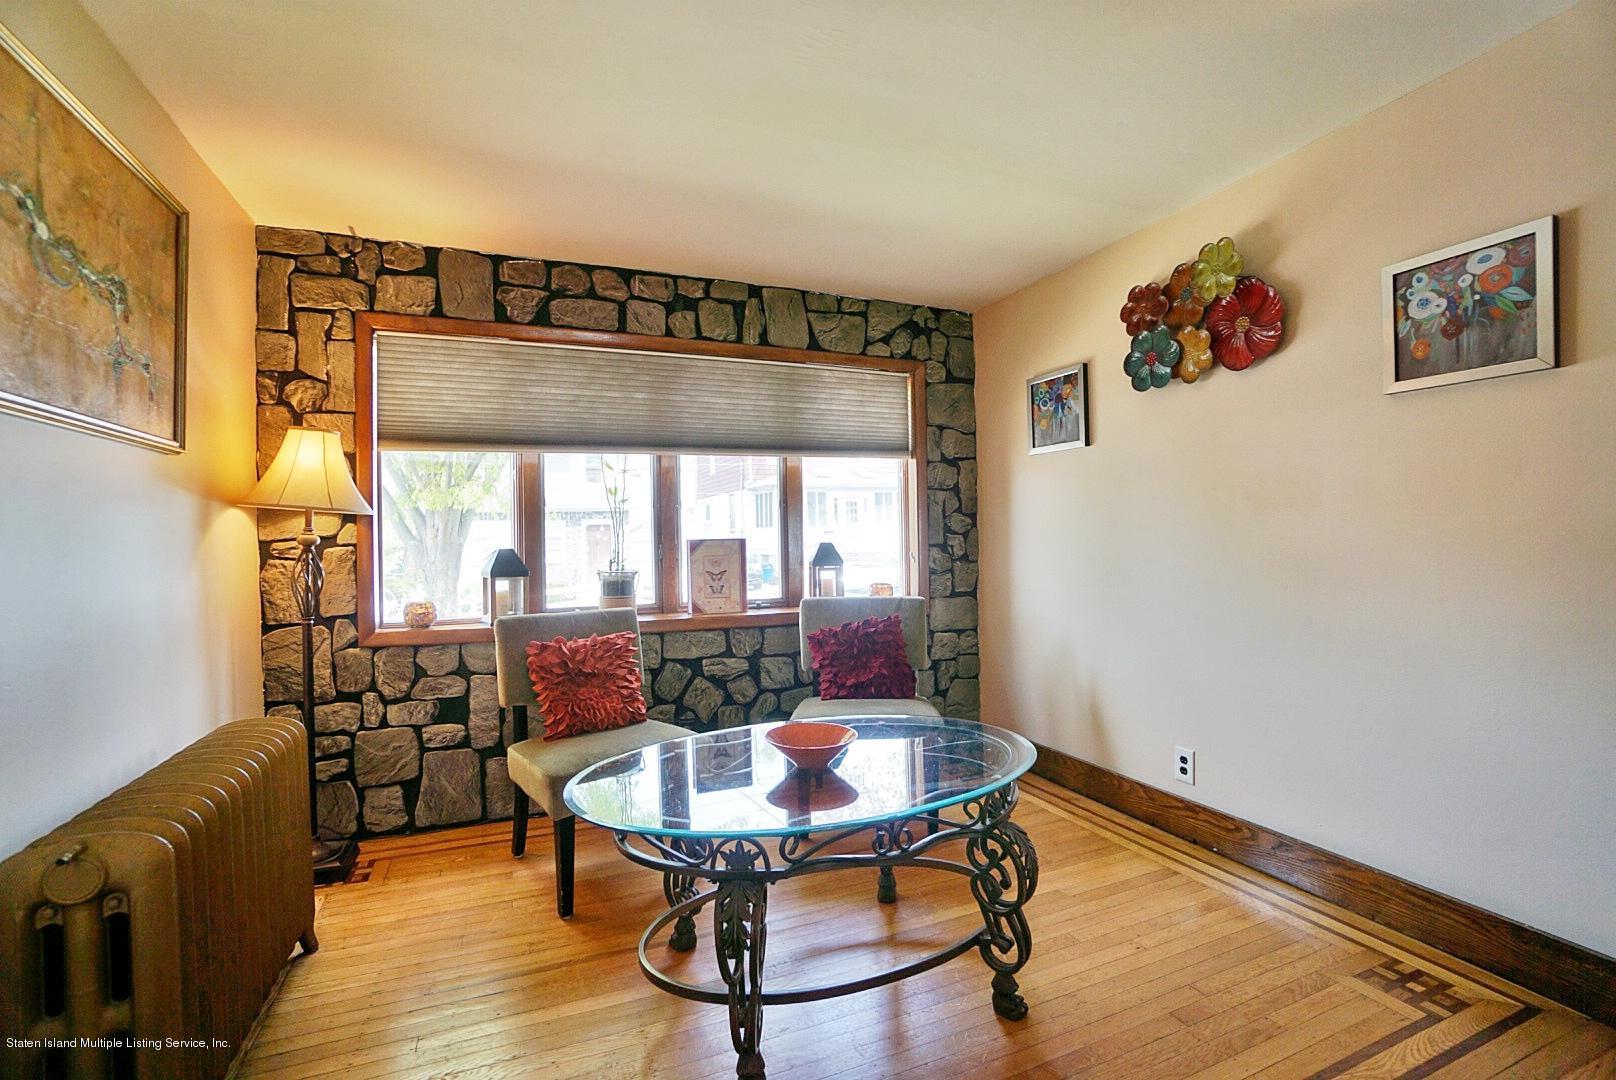 Single Family - Detached 22 Maine Avenue  Staten Island, NY 10314, MLS-1128323-16